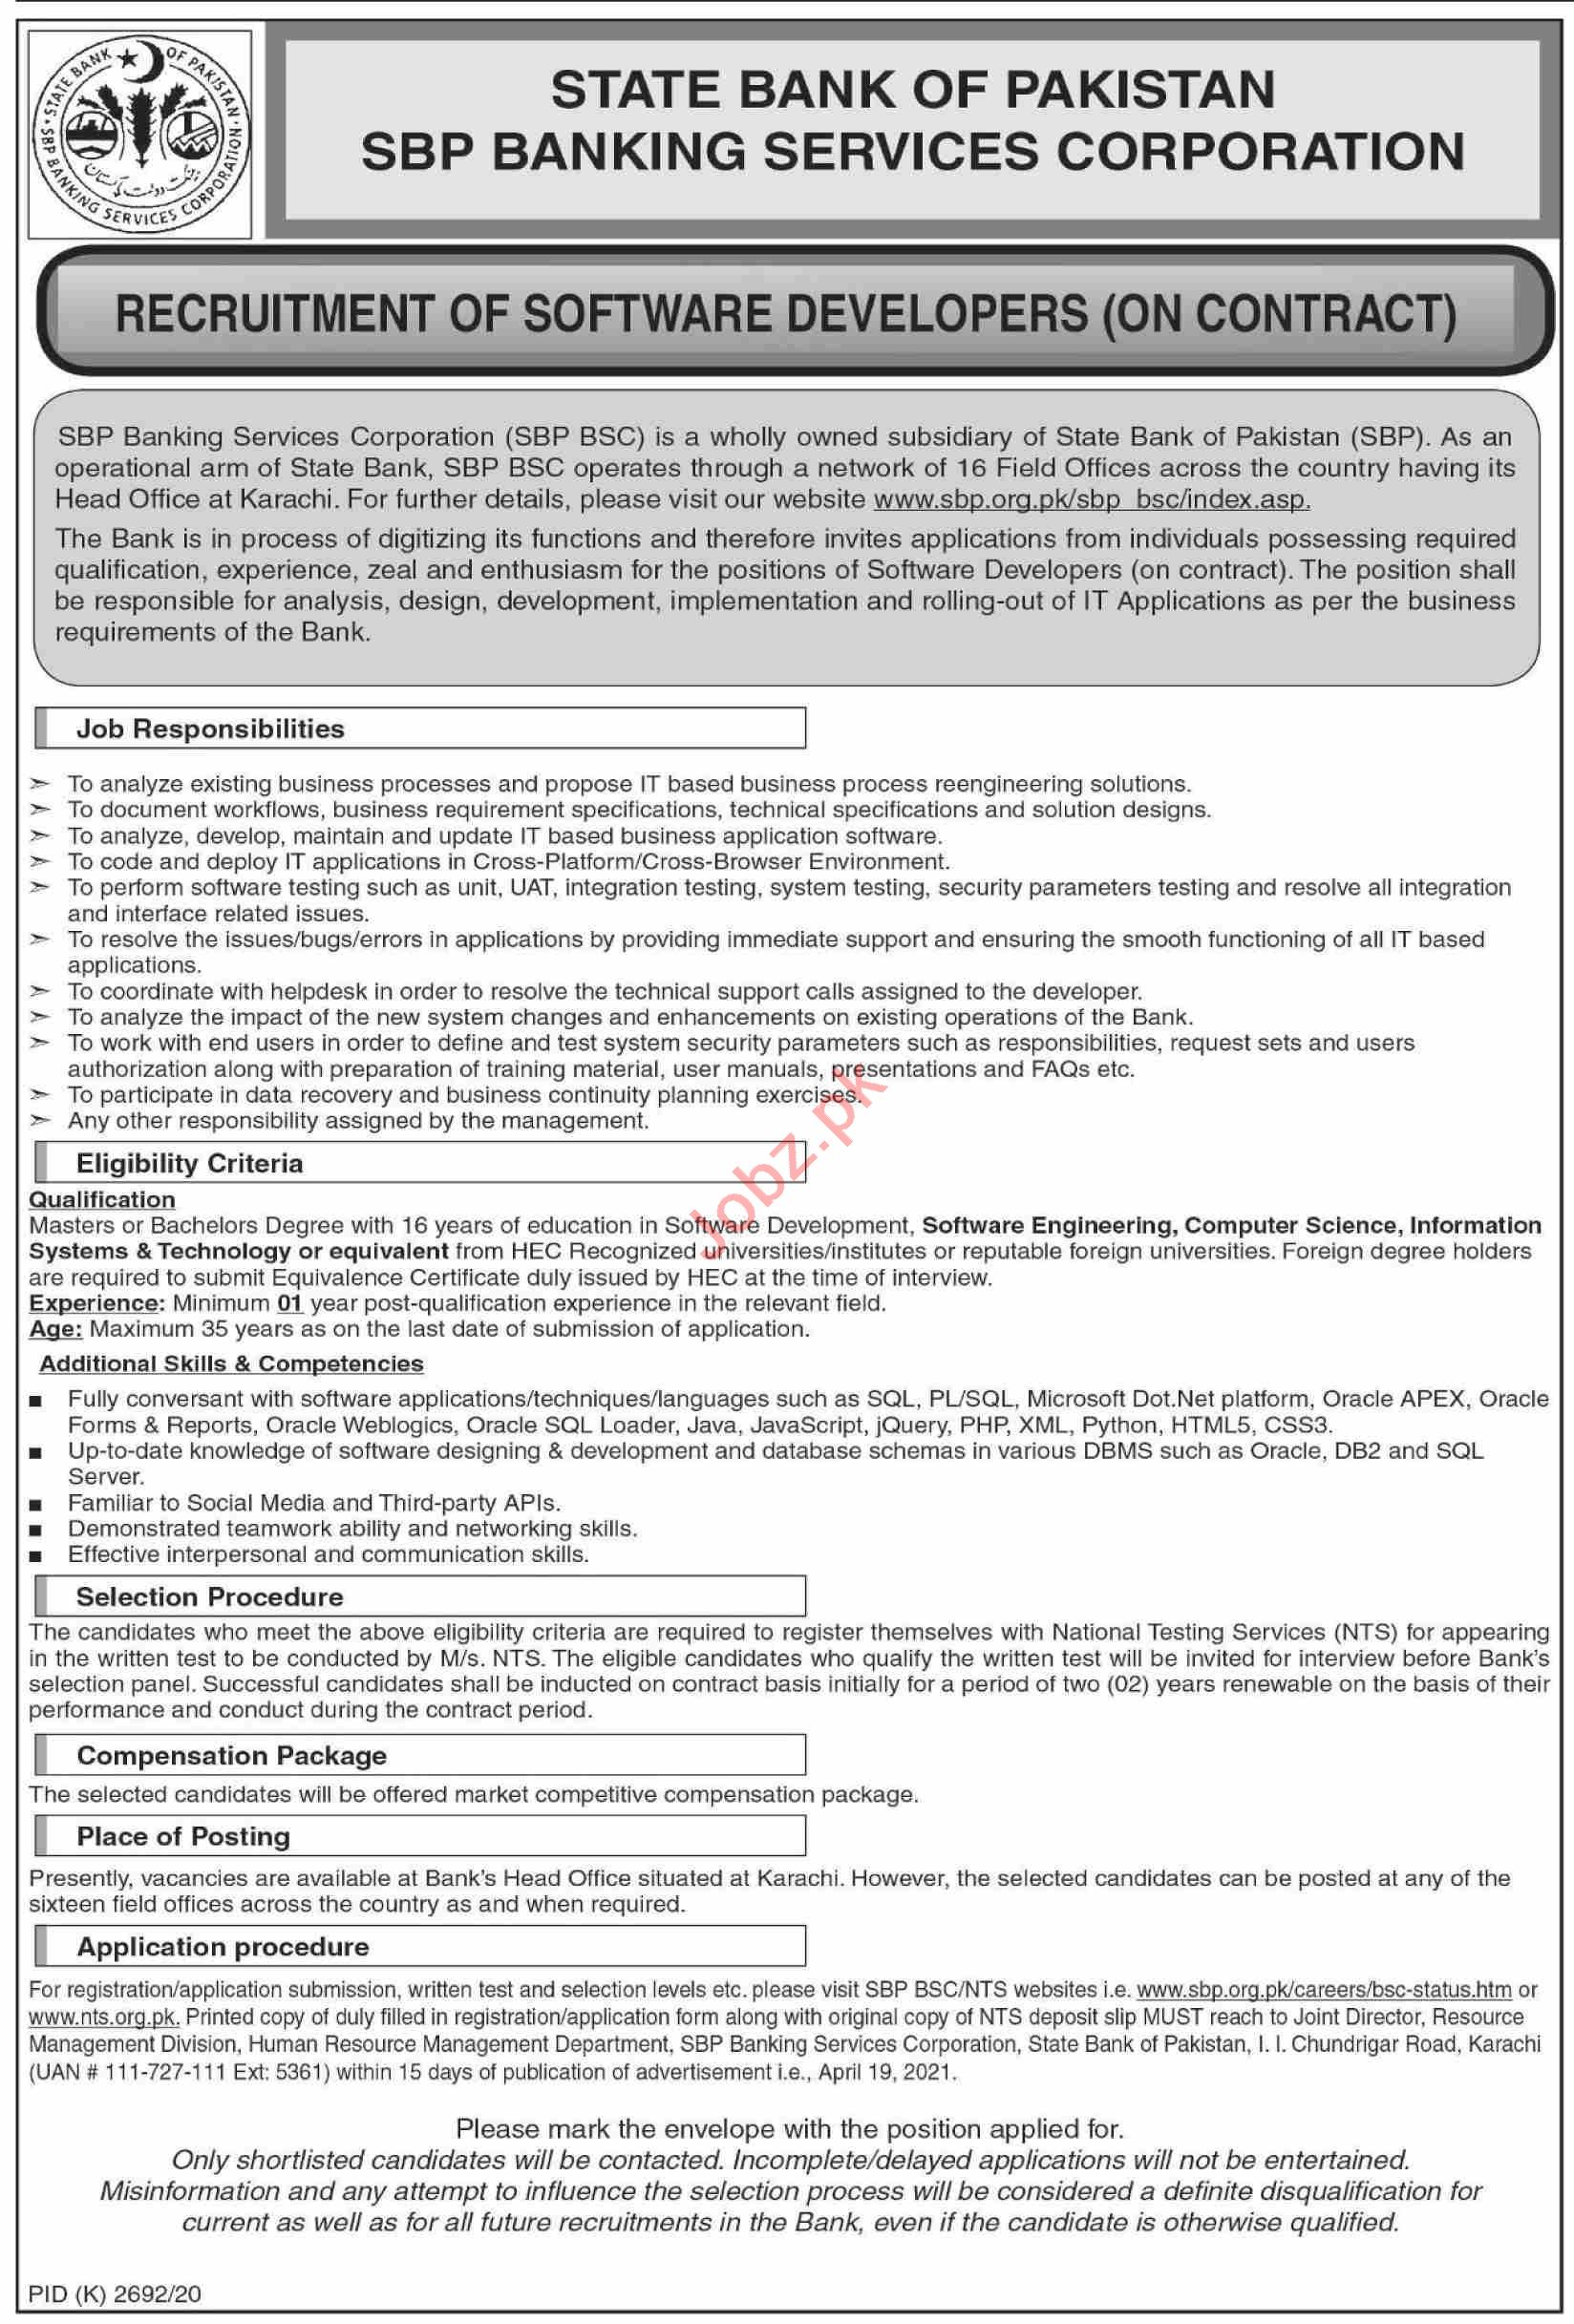 SBP BSC Banking Services Corporation Karachi Jobs 2021